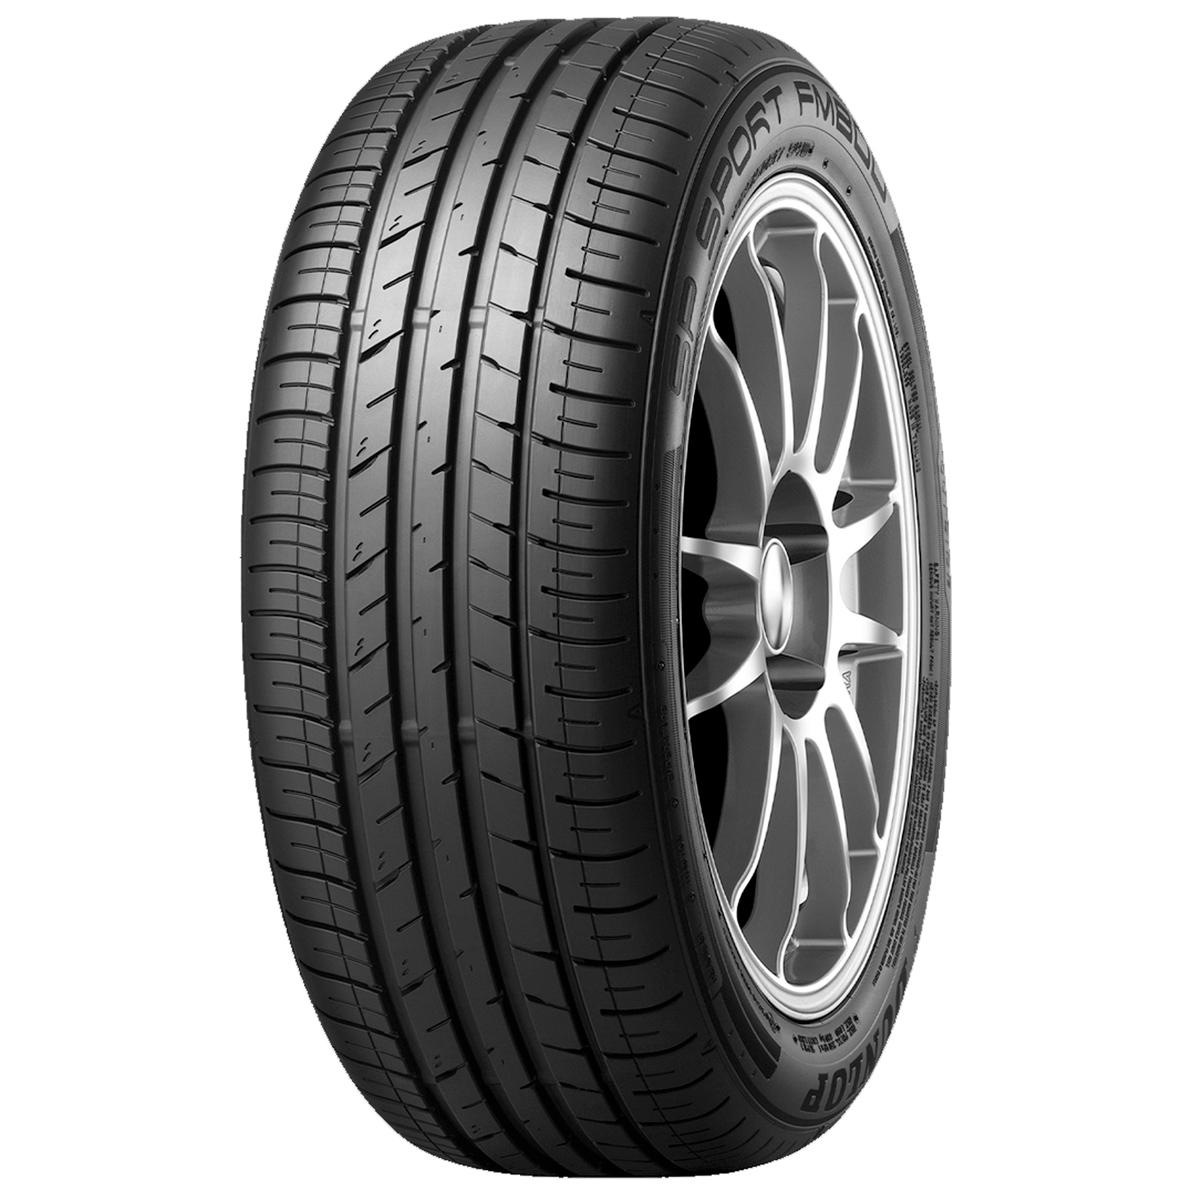 Pneu Dunlop 185/55r16 83V SP Sport FM800